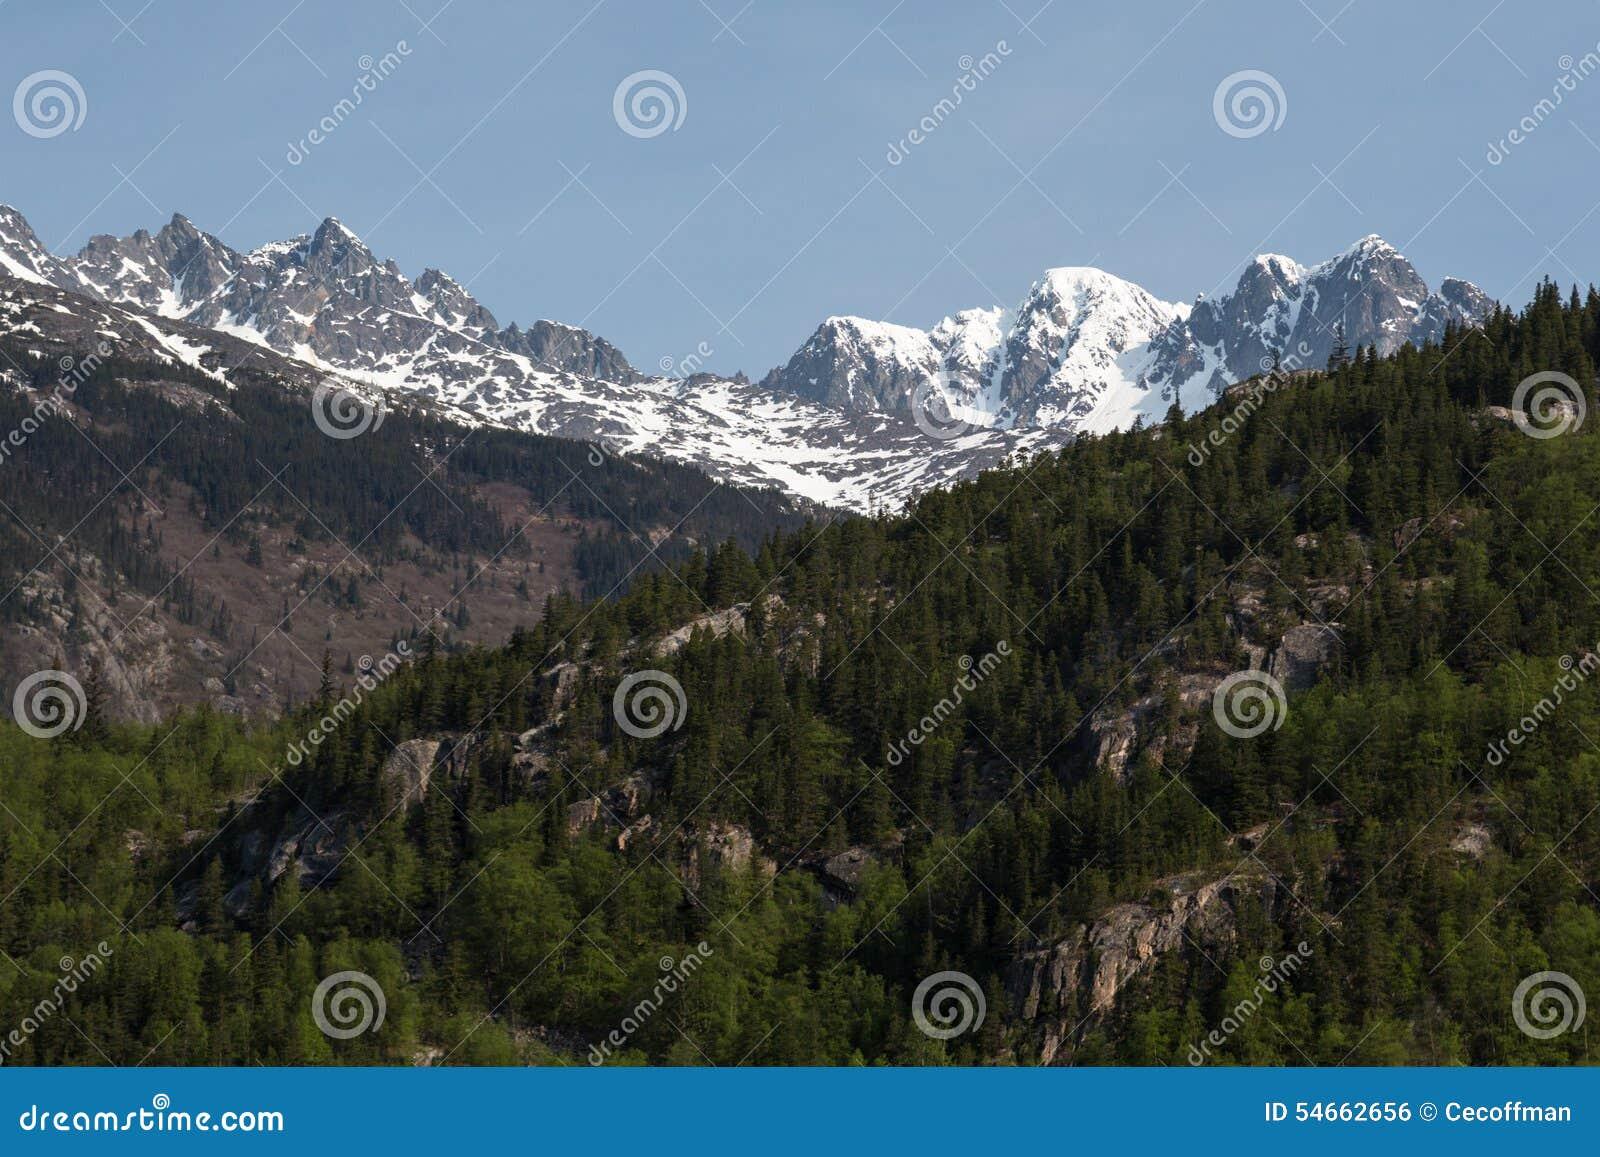 Craggy Berge